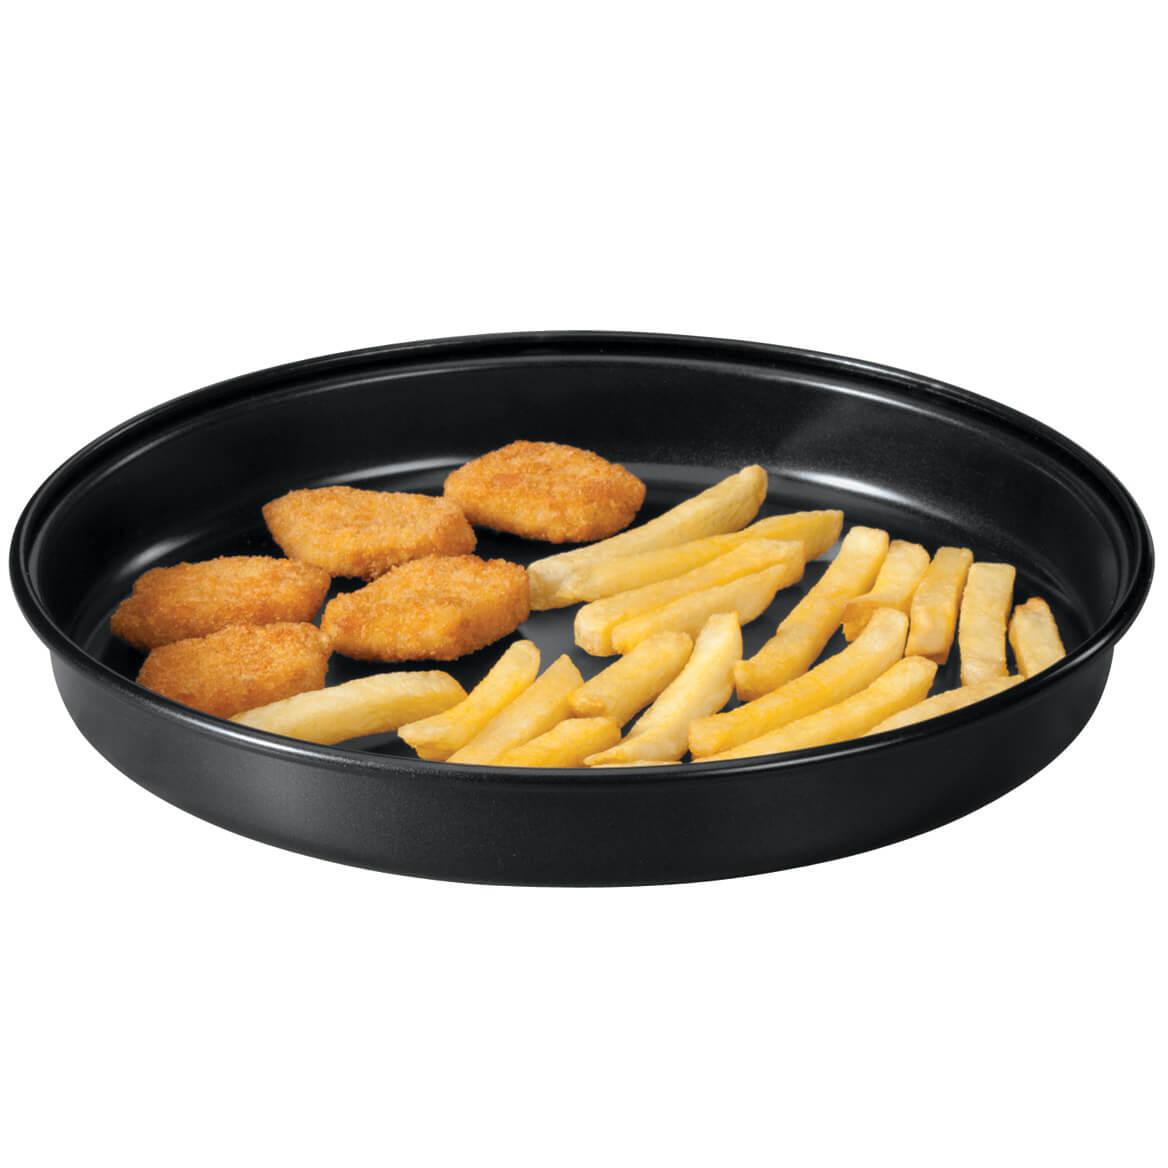 Microwave Crisper Pan-344853